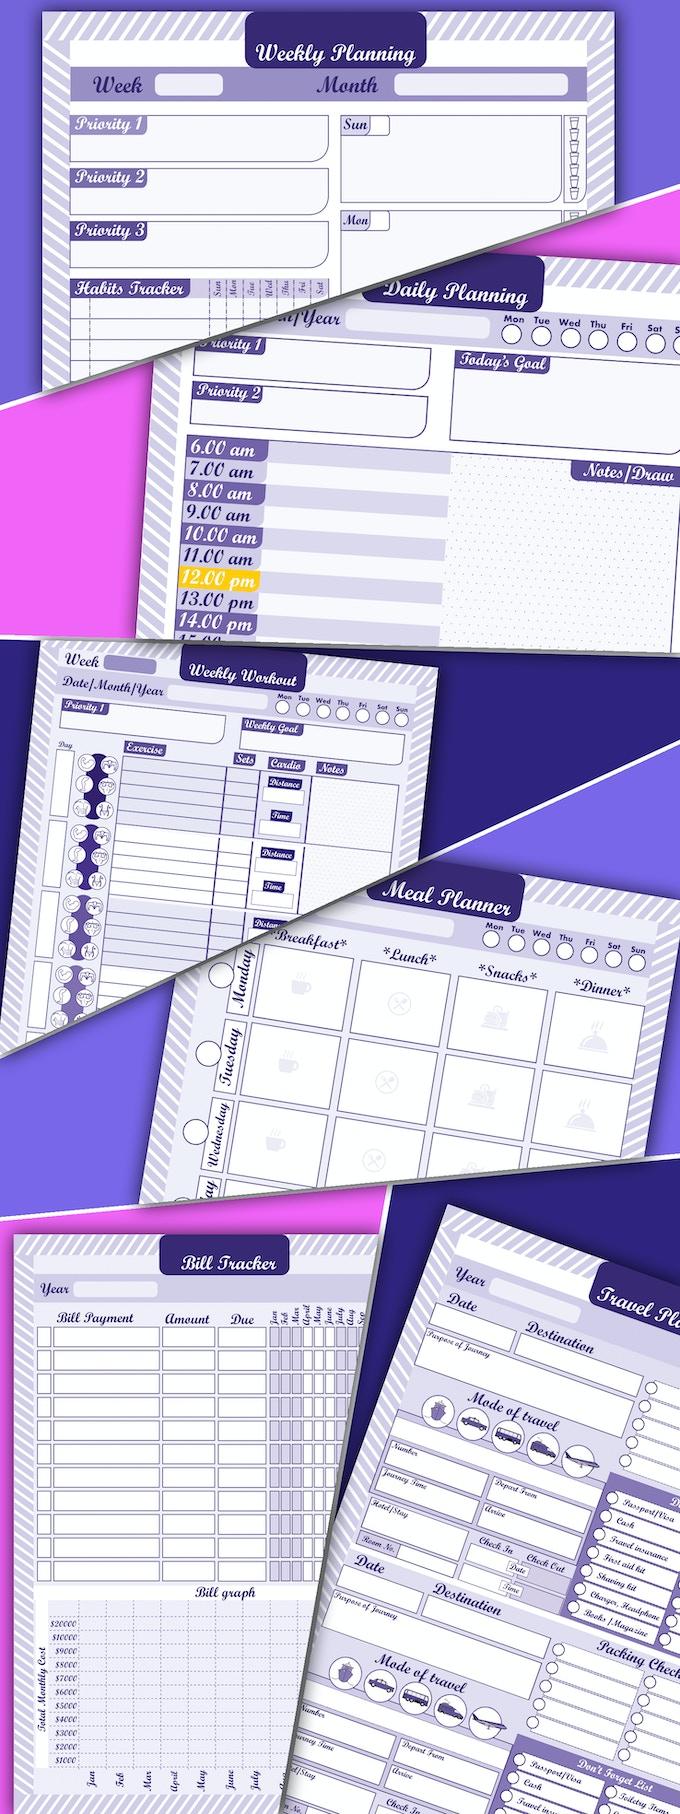 Kickstarter Calendar Planner : Productive desk pad planners printable full collection